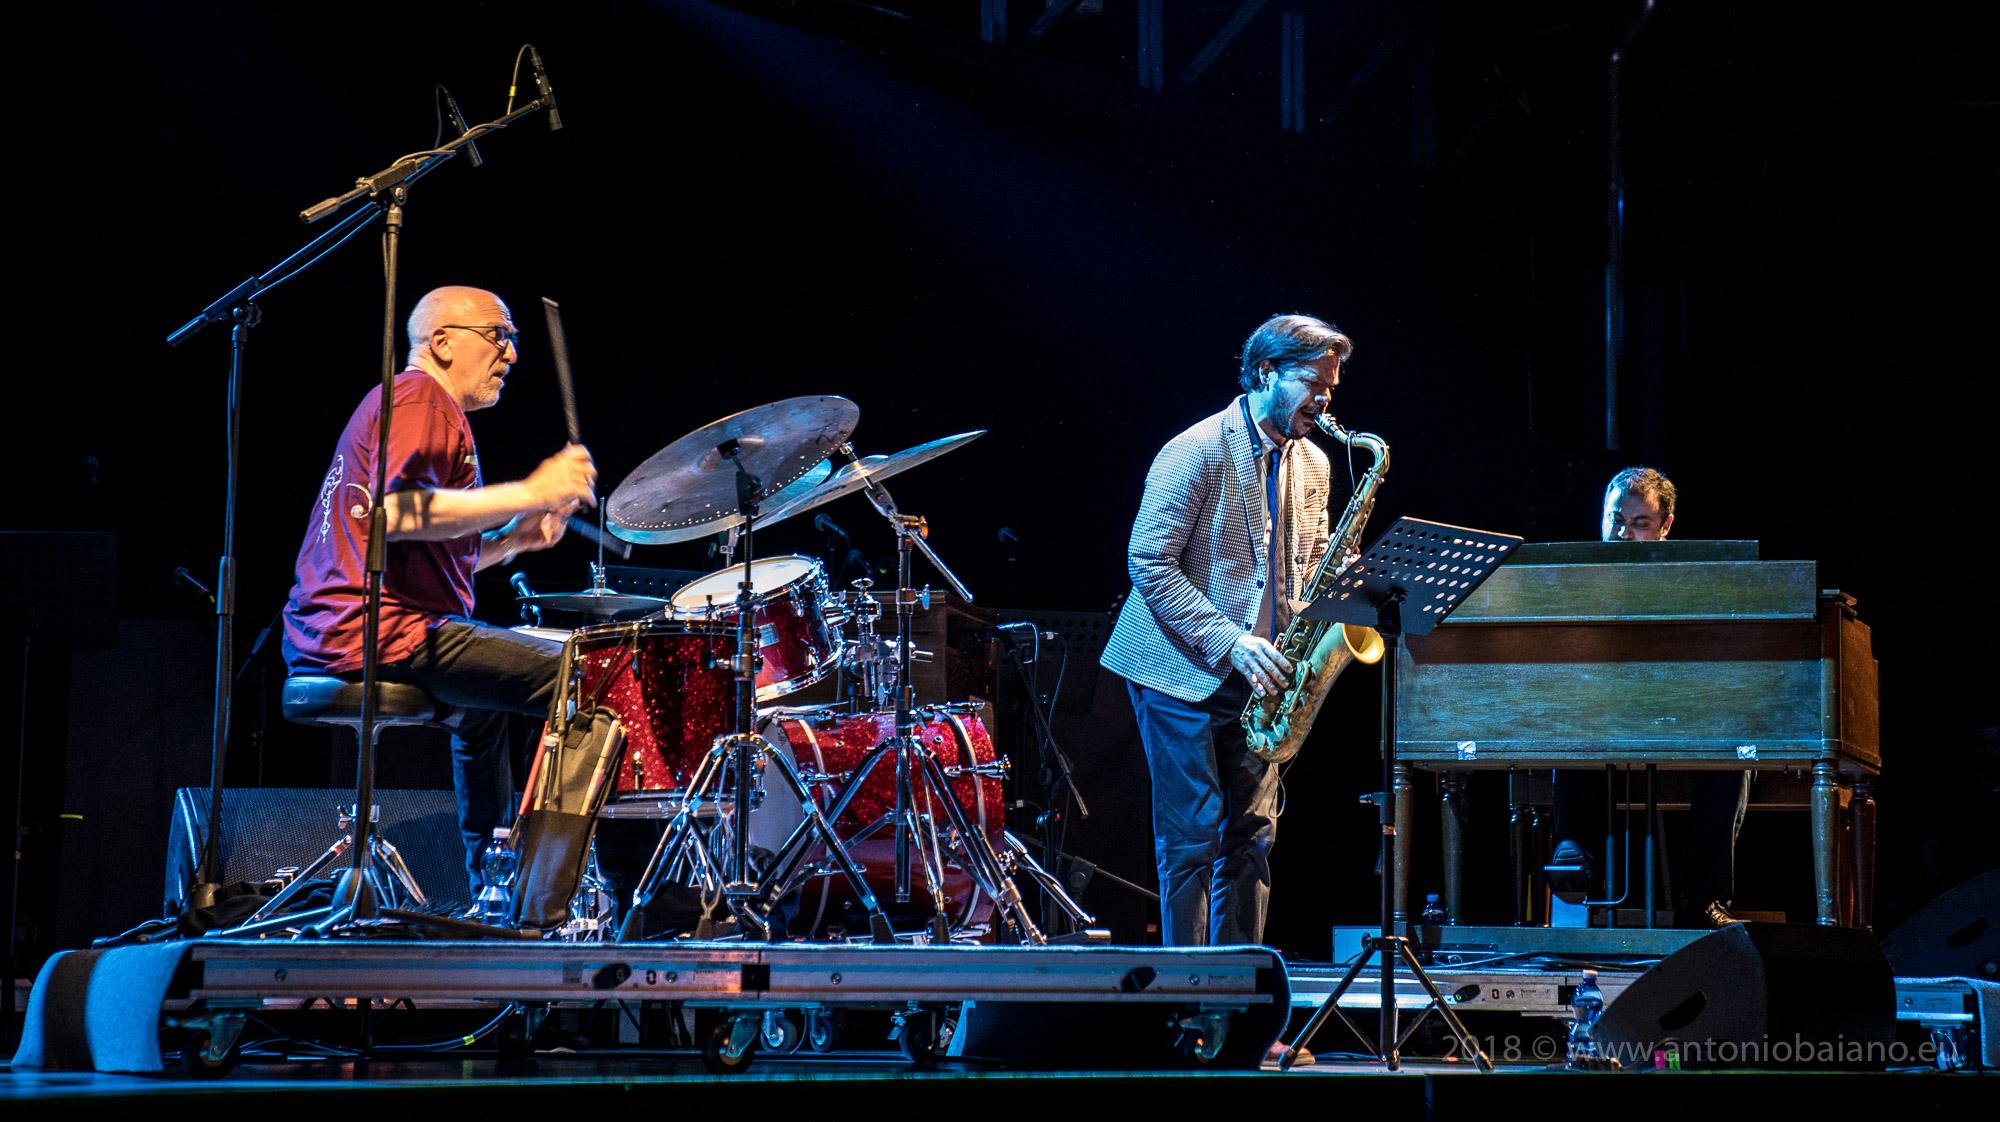 Gurrisi/Nussbaum/Blake Trio - TJF 2018